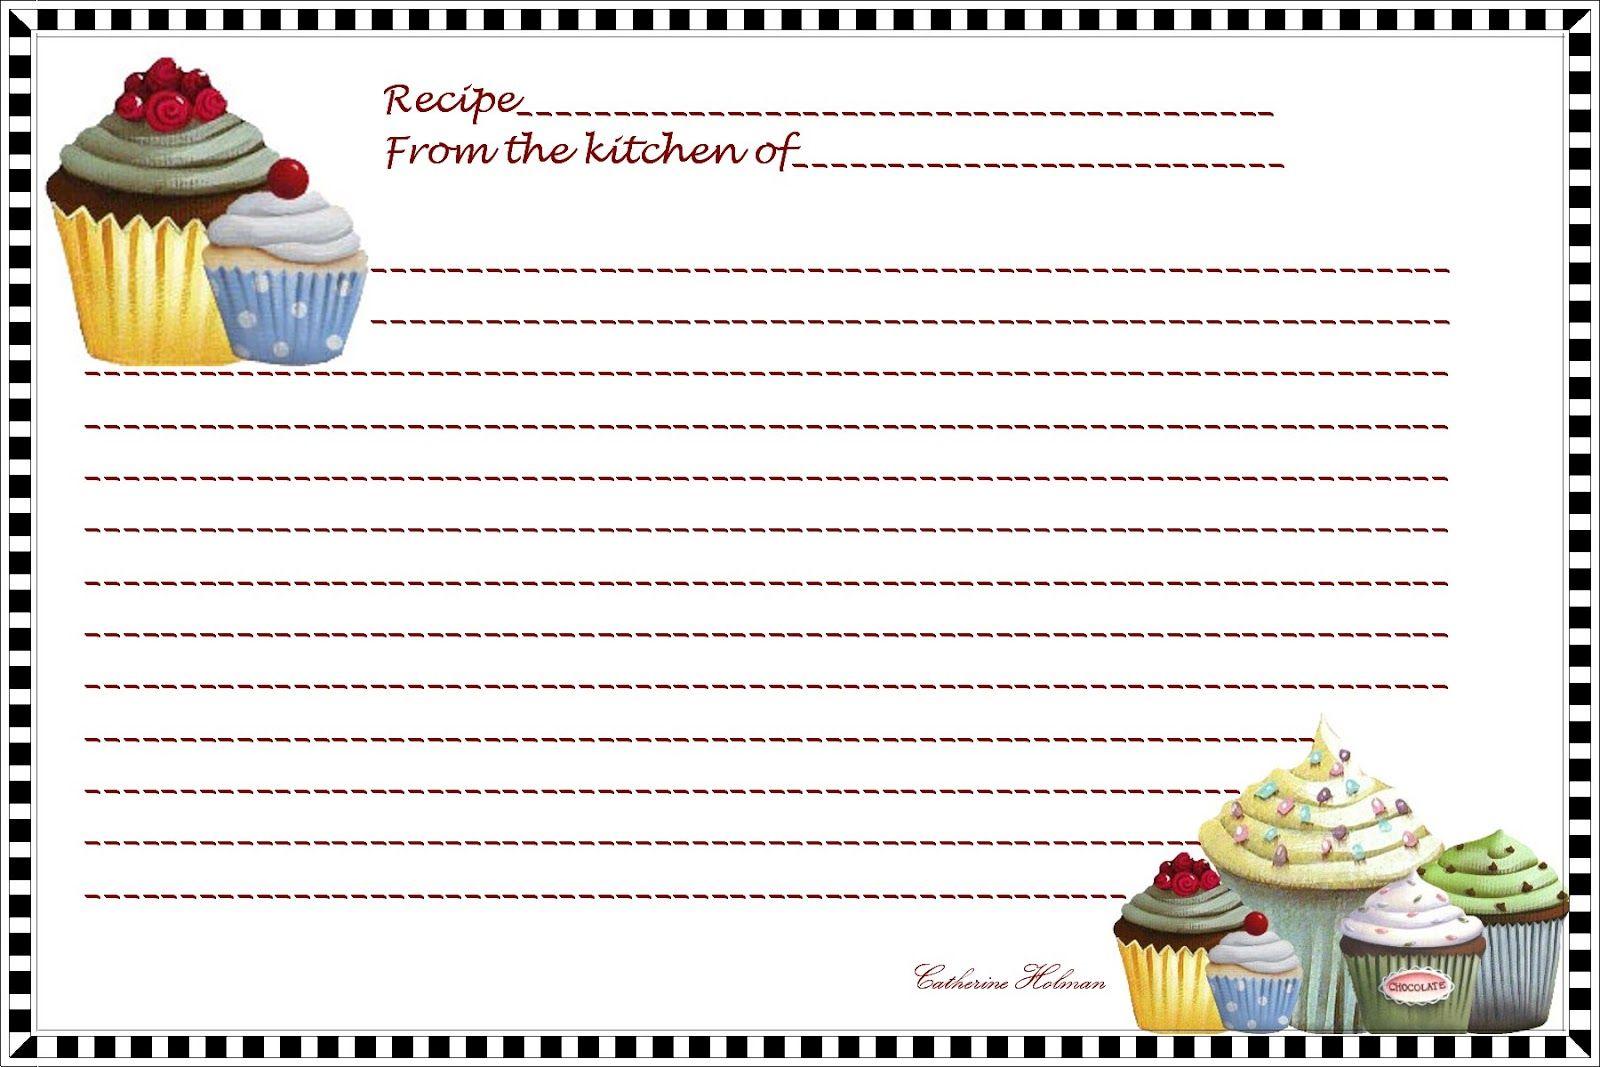 free printables recipes index card